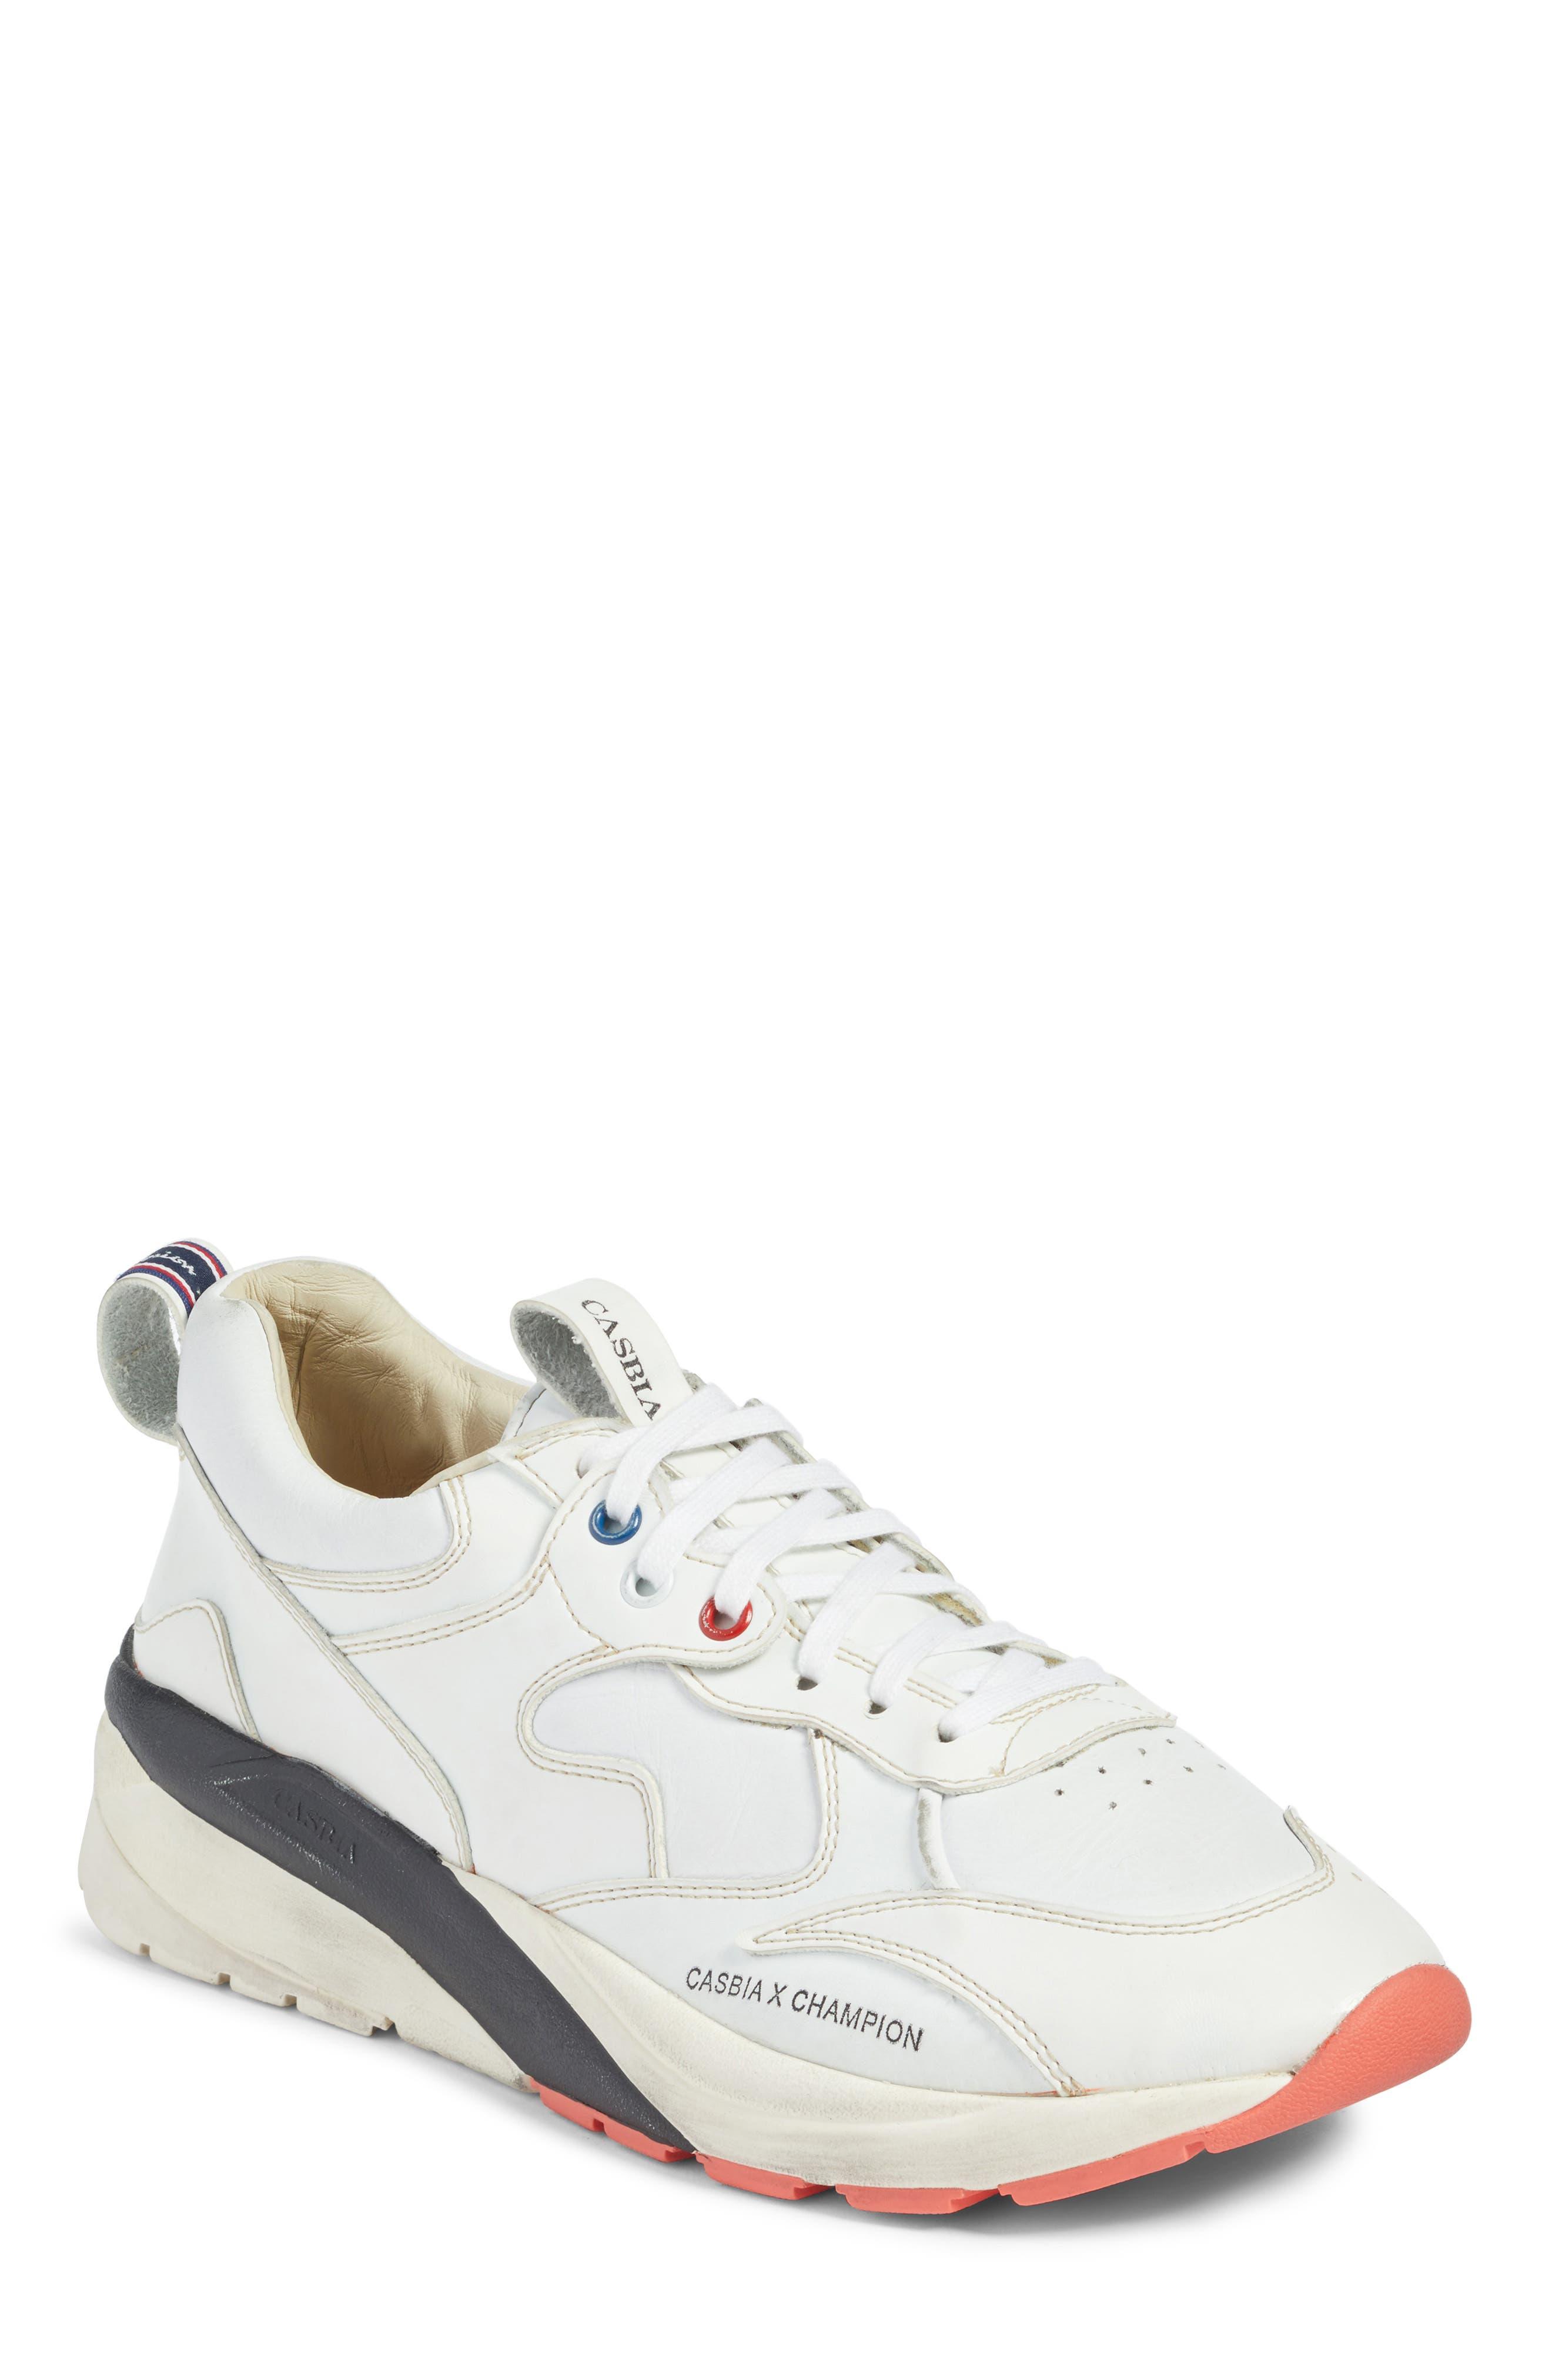 Casbia Champion Veloce ATL Sneaker (Men)